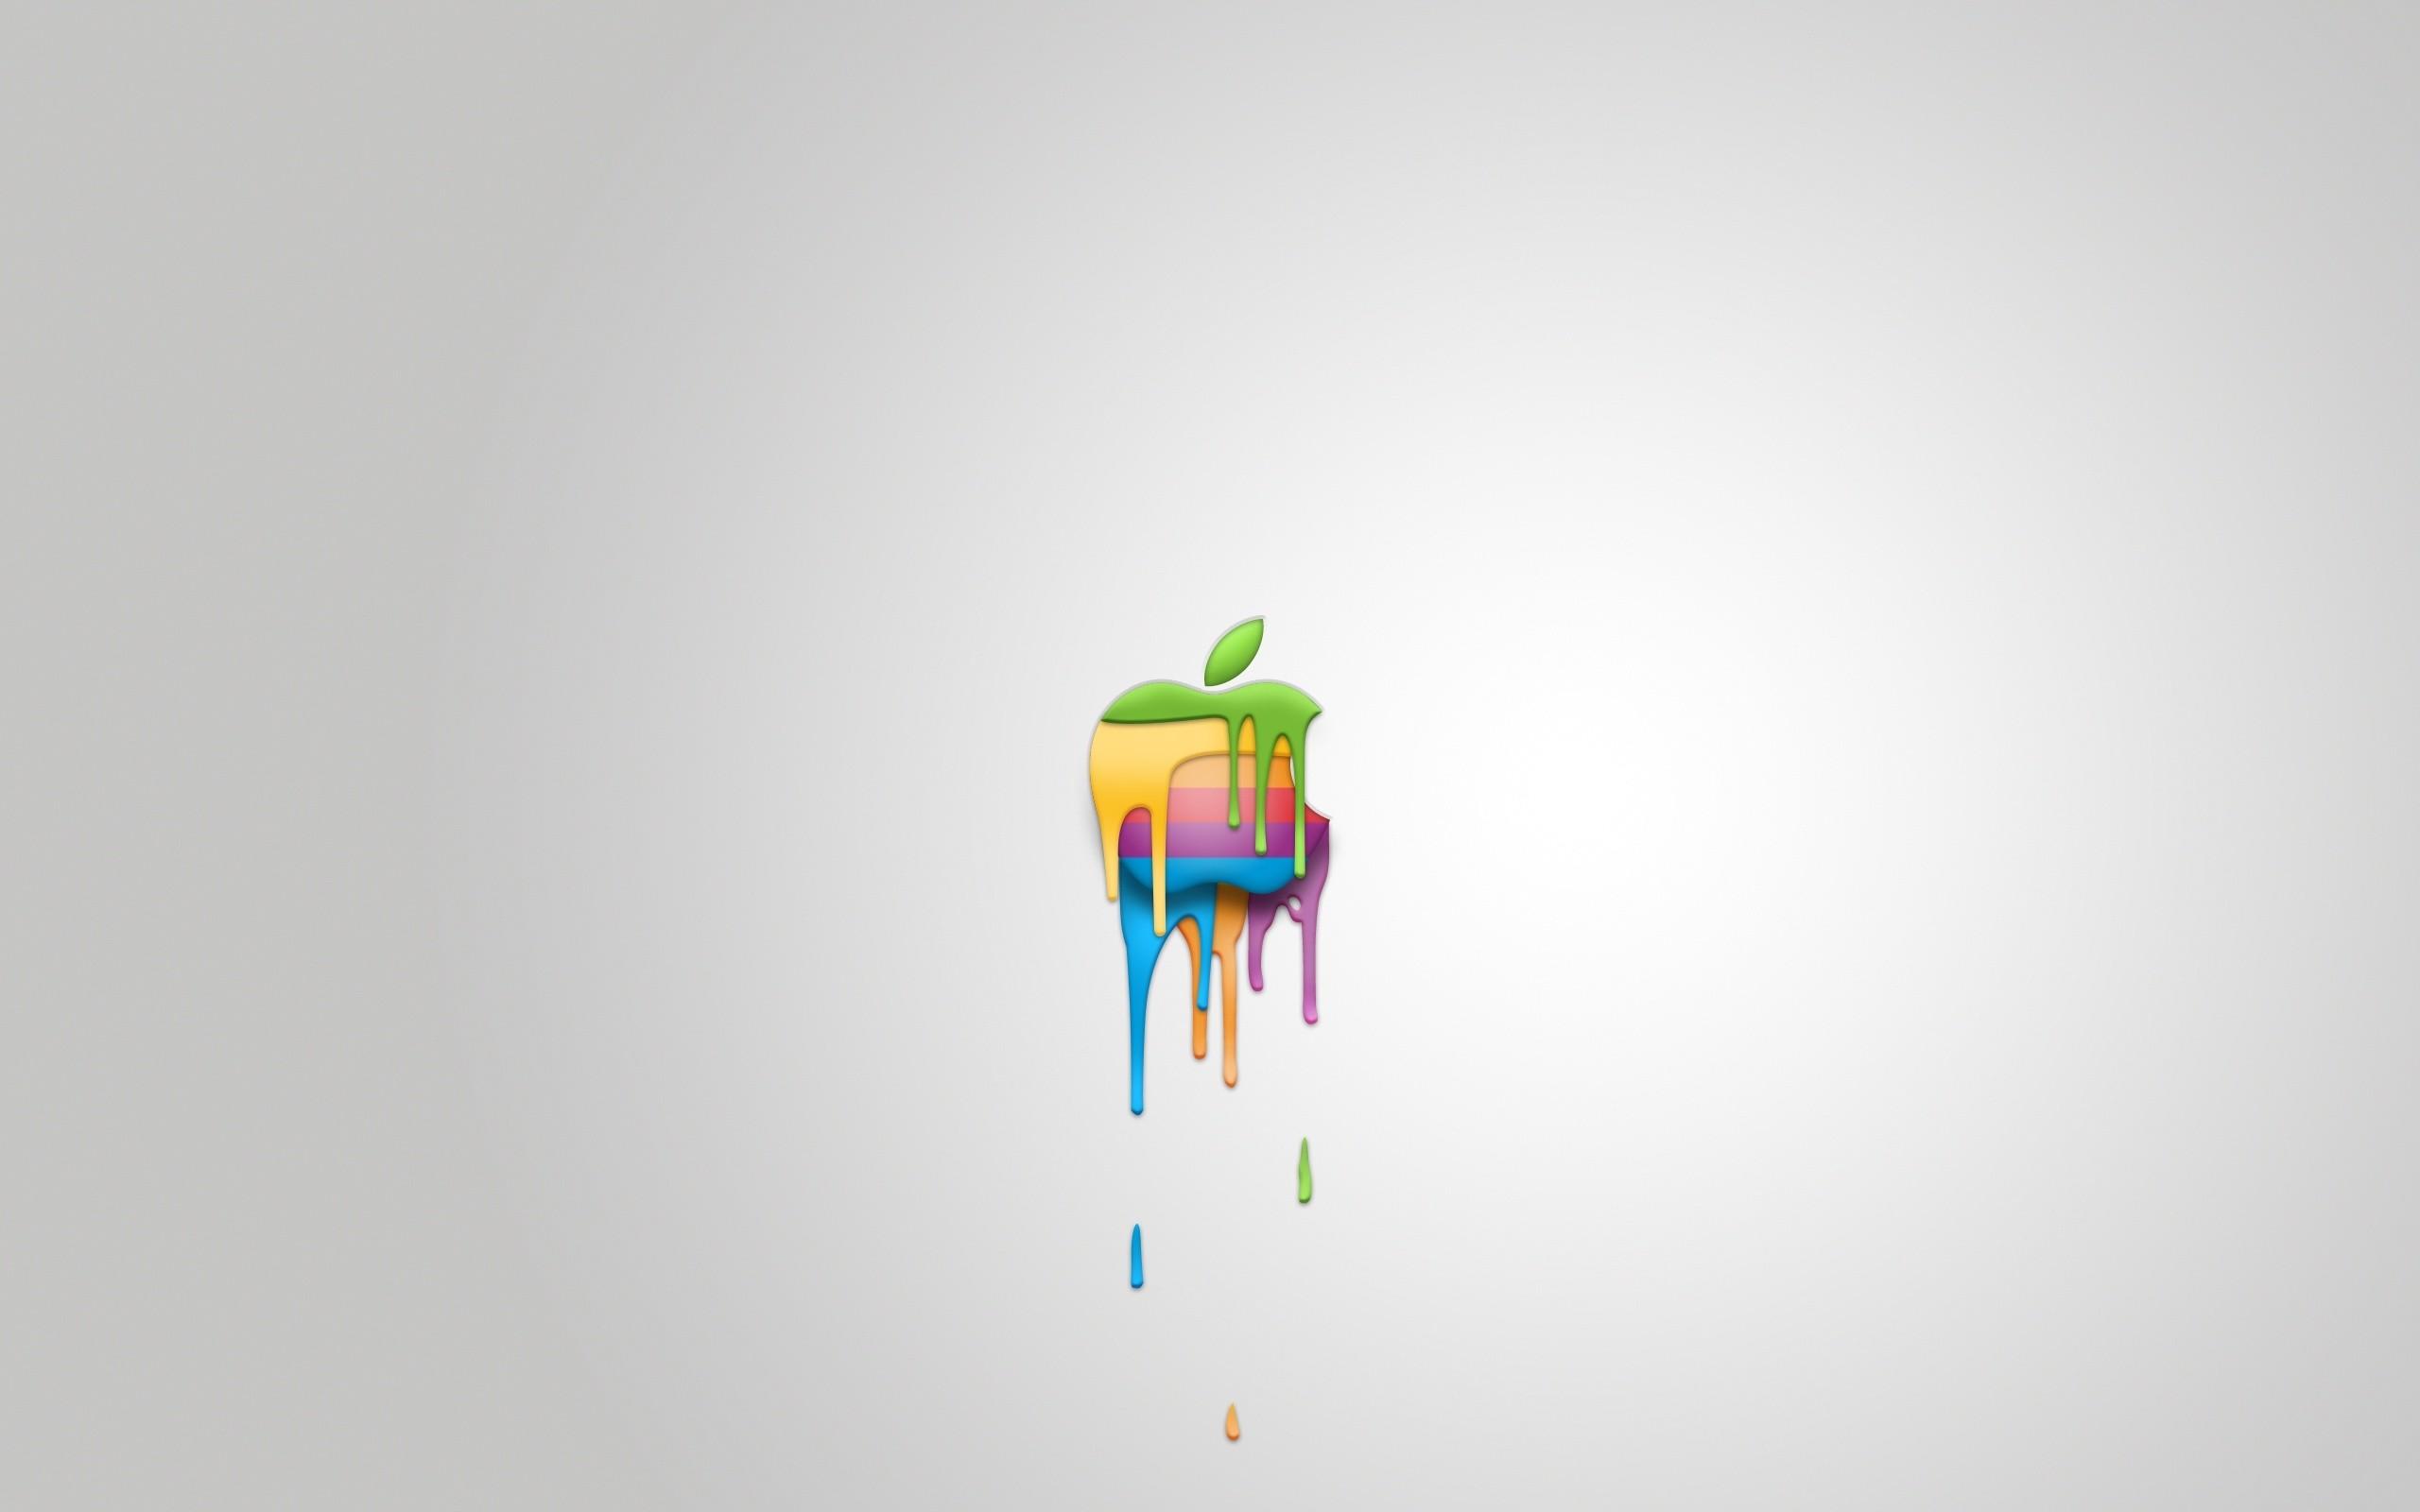 Desktop Backgrounds Apple 76 Pictures